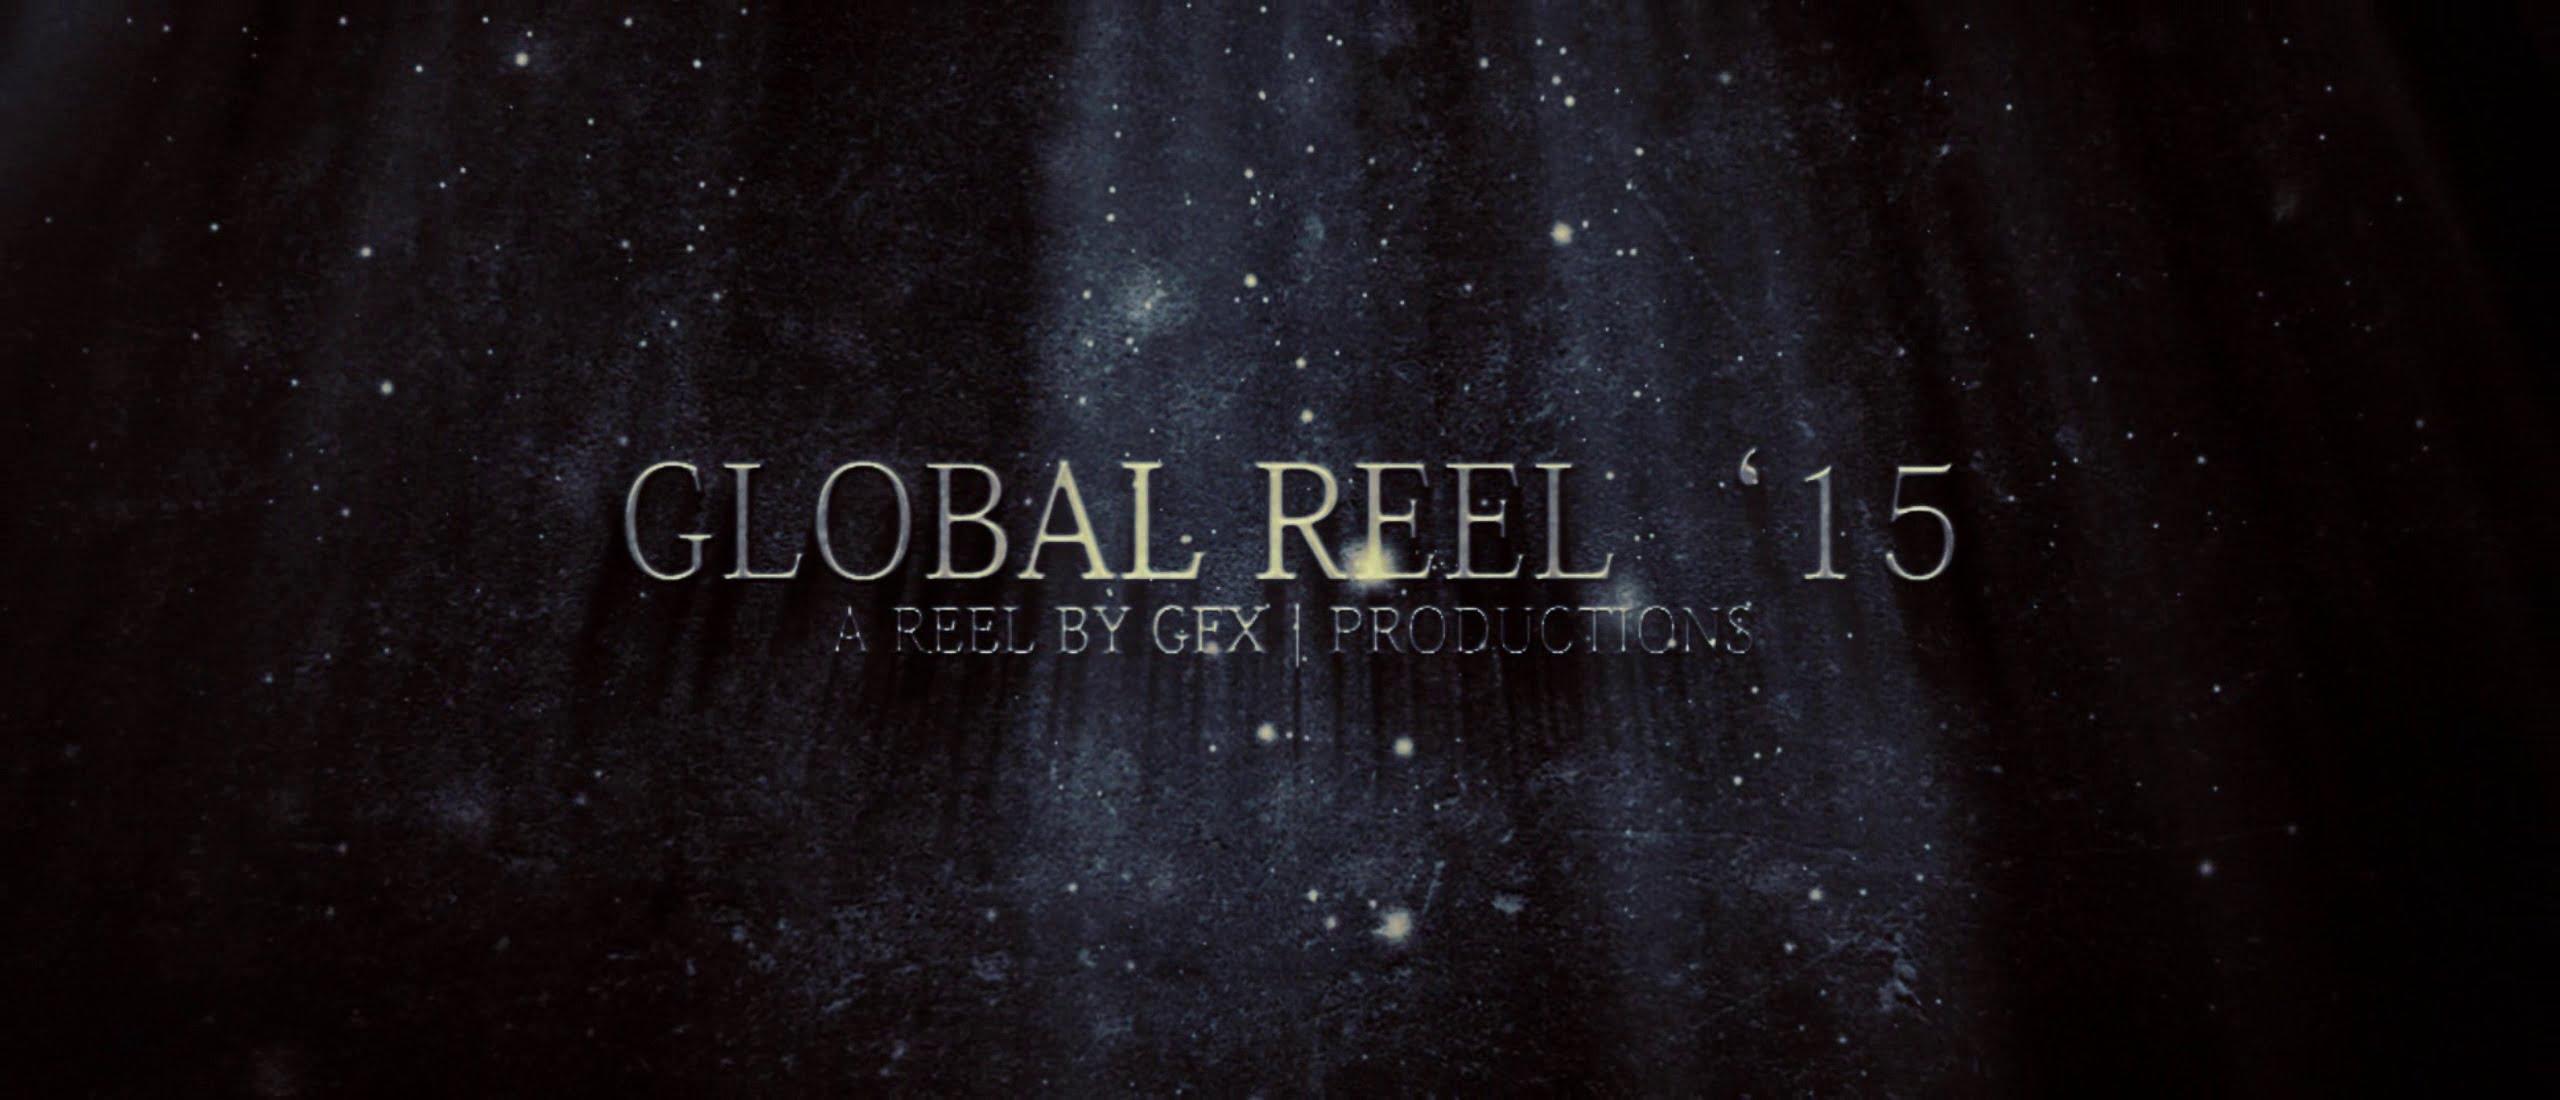 Global Reel '15 #GFXPRO